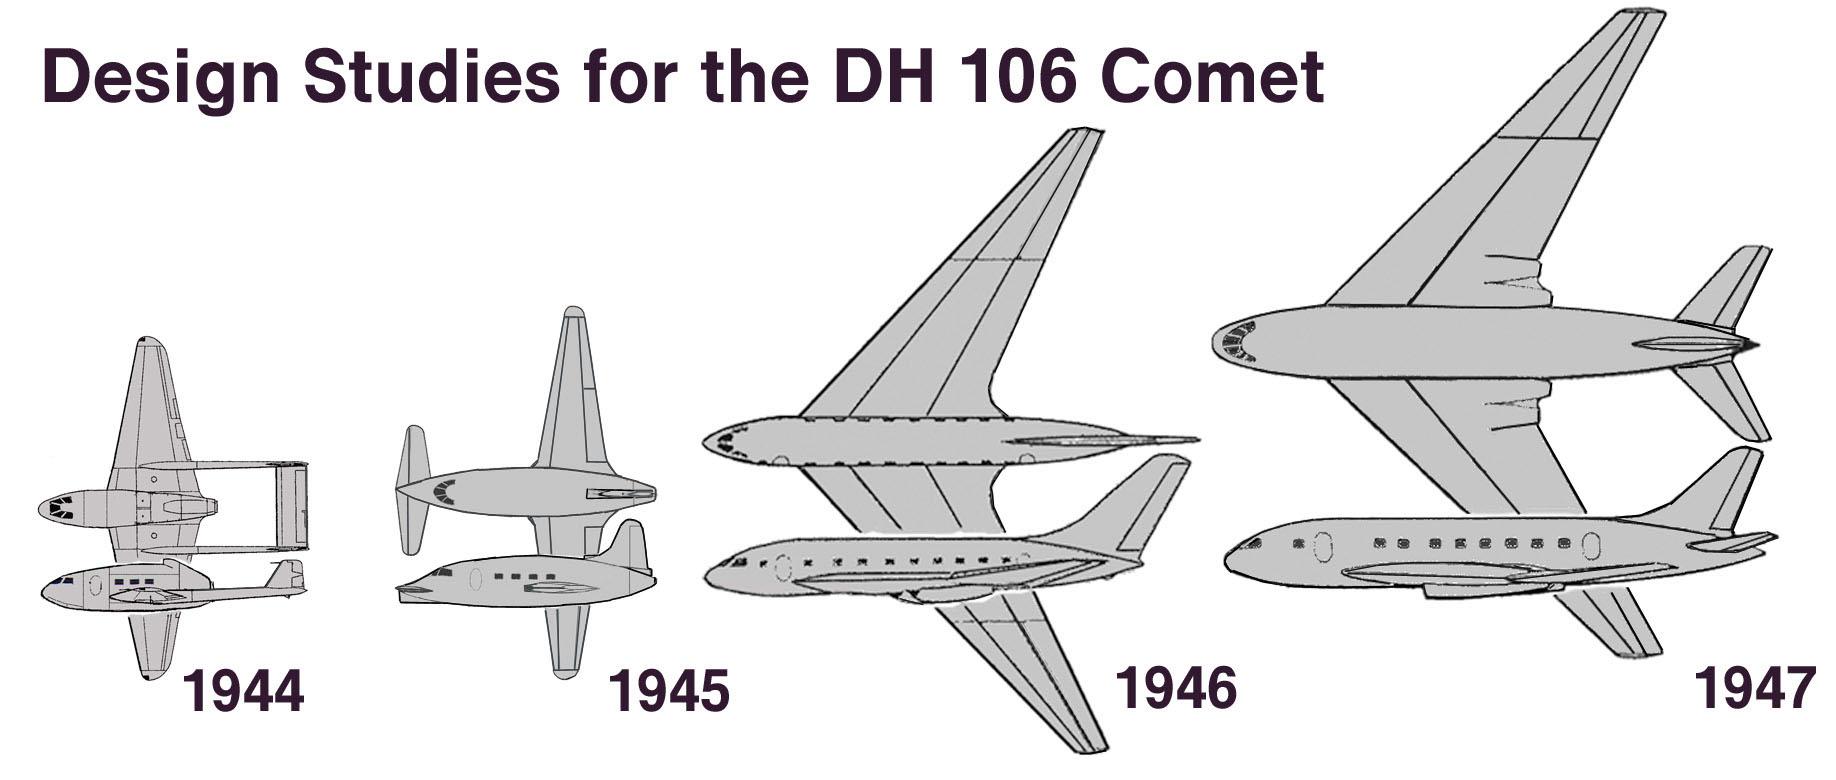 Soubor Design Stu S For The Dh 106 Comet Wikipe